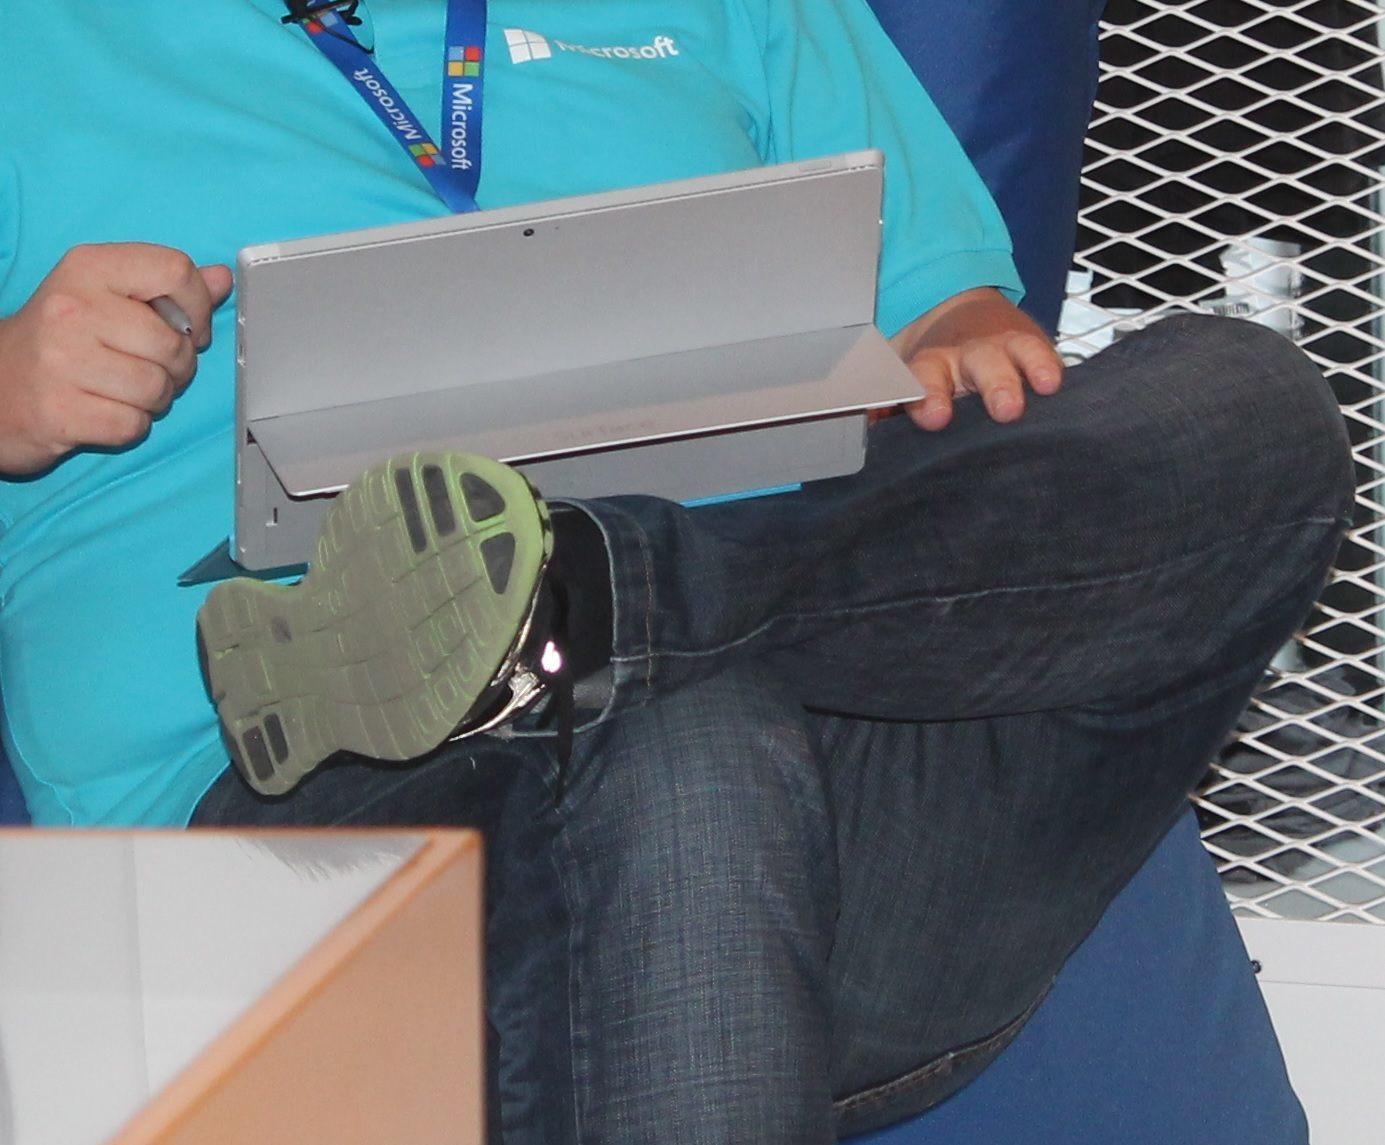 Lapability Surface Pro 3